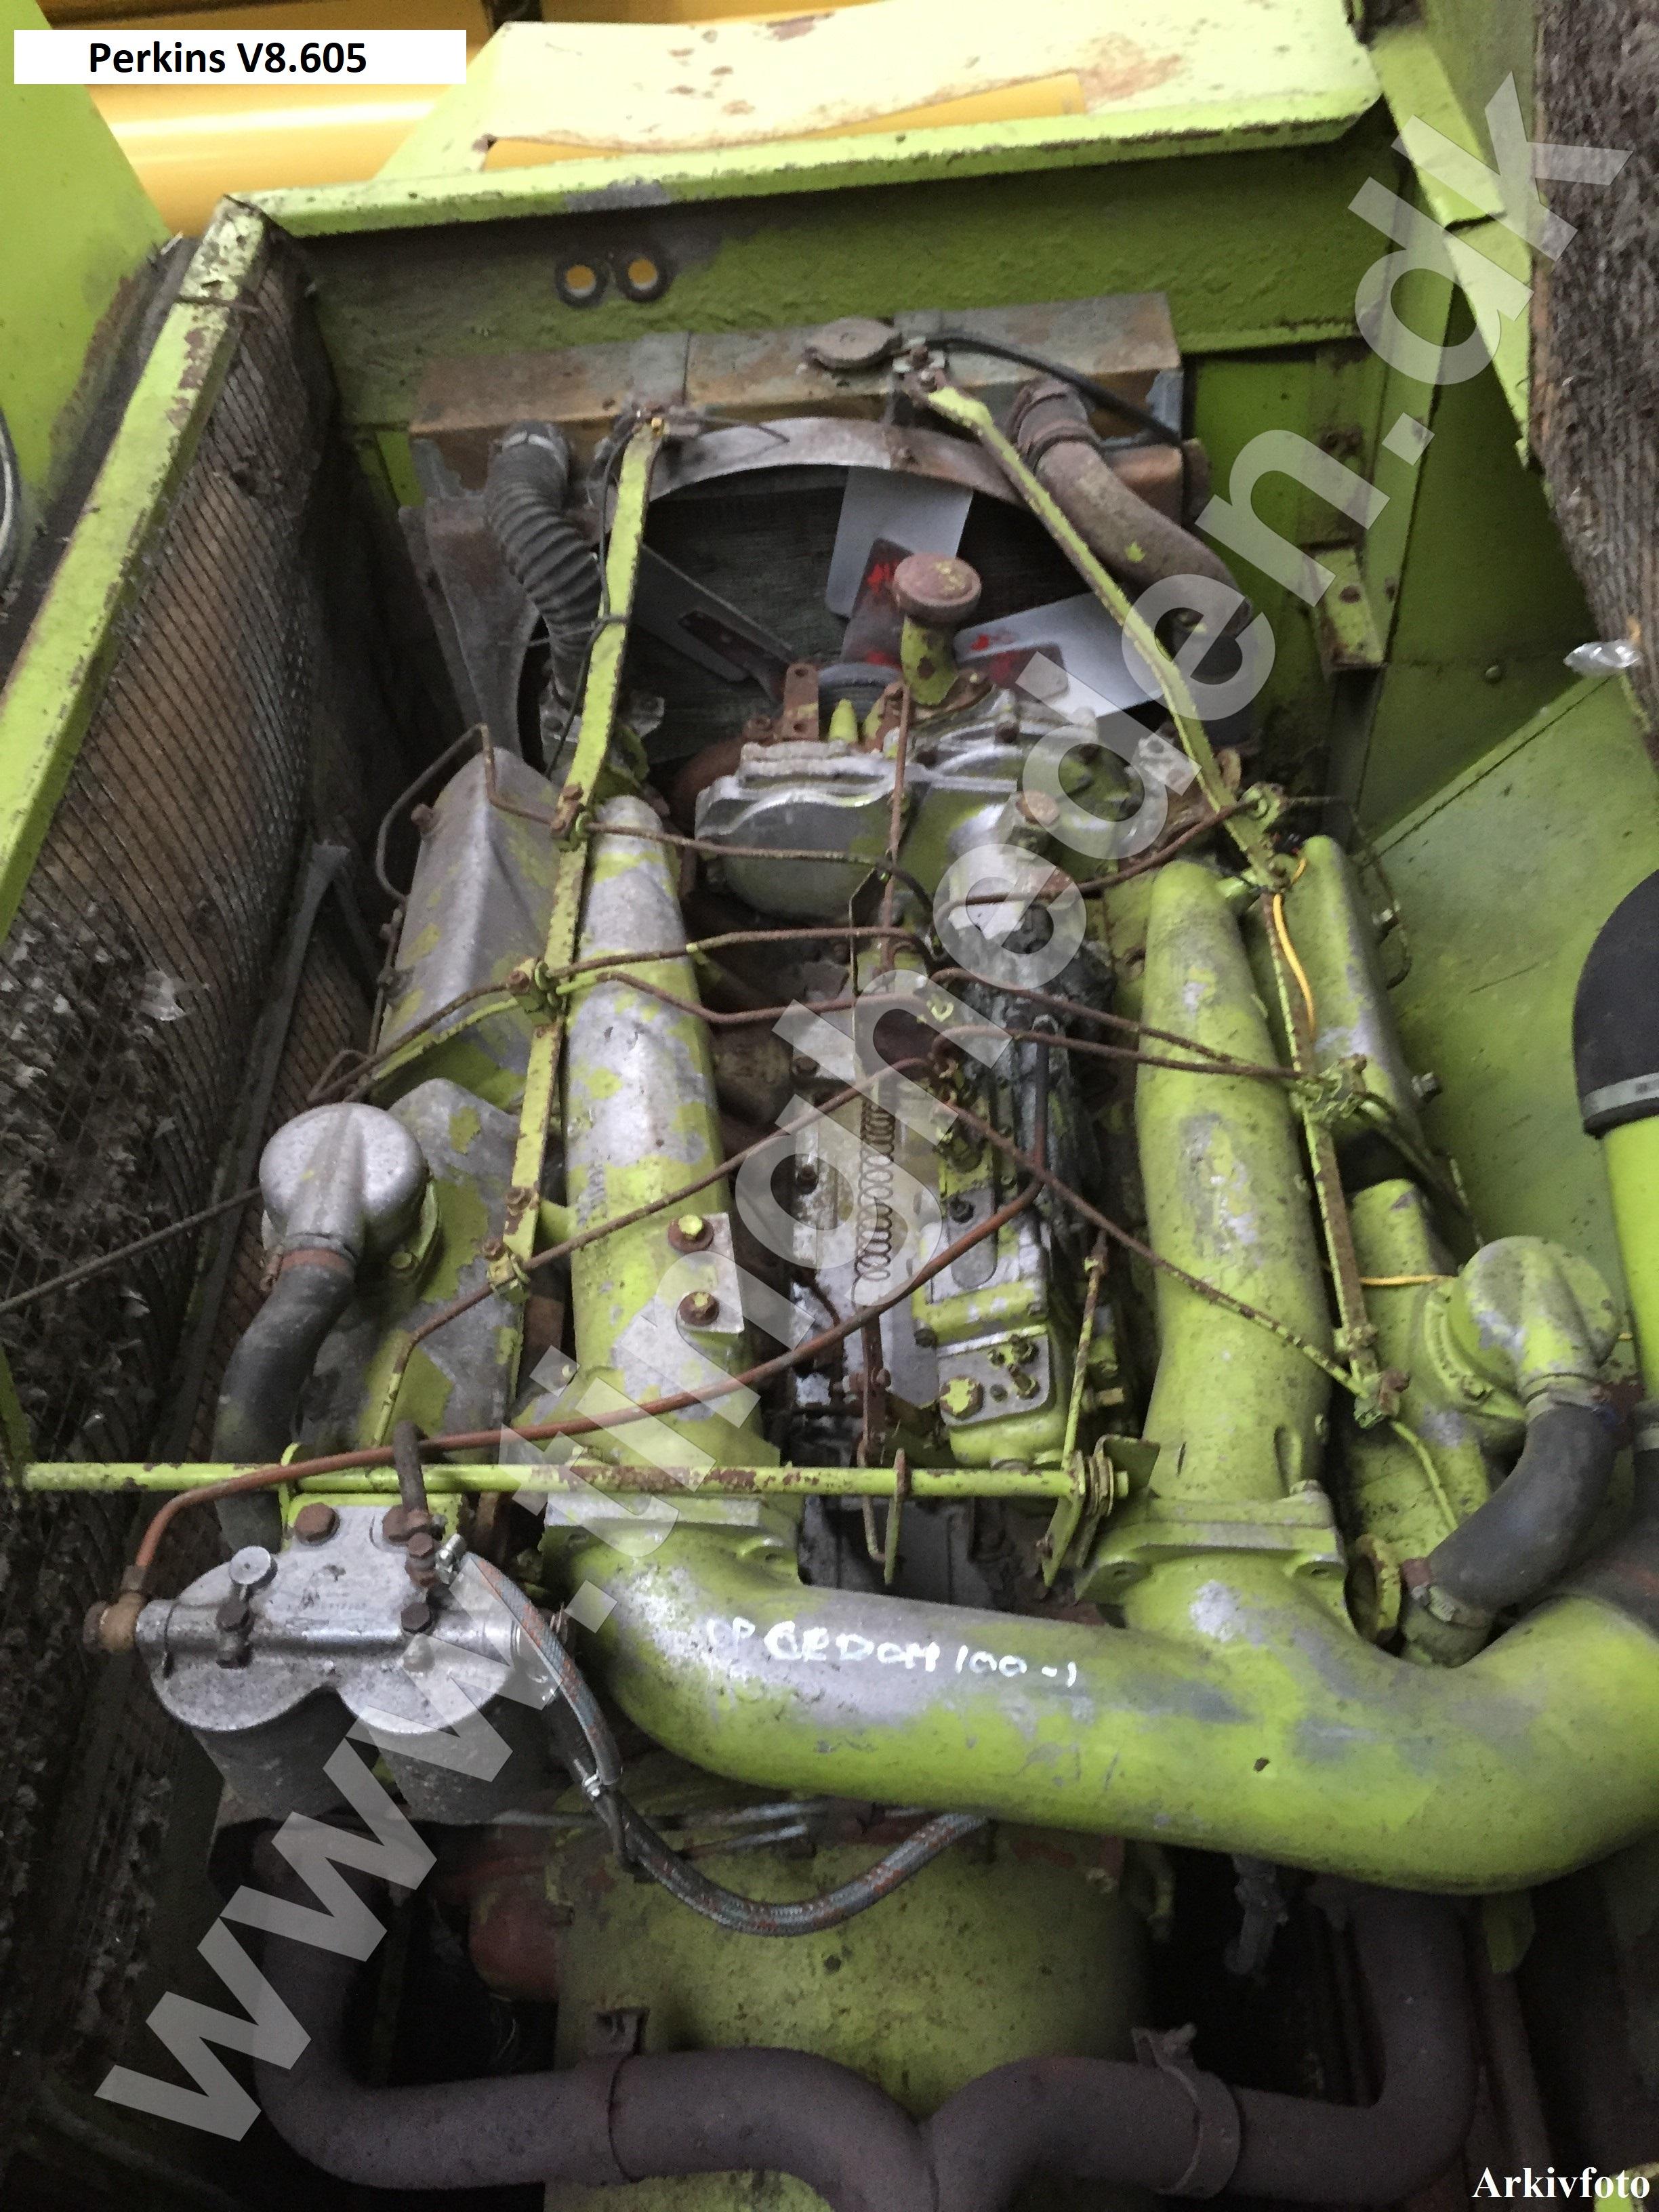 Perkins V8.605